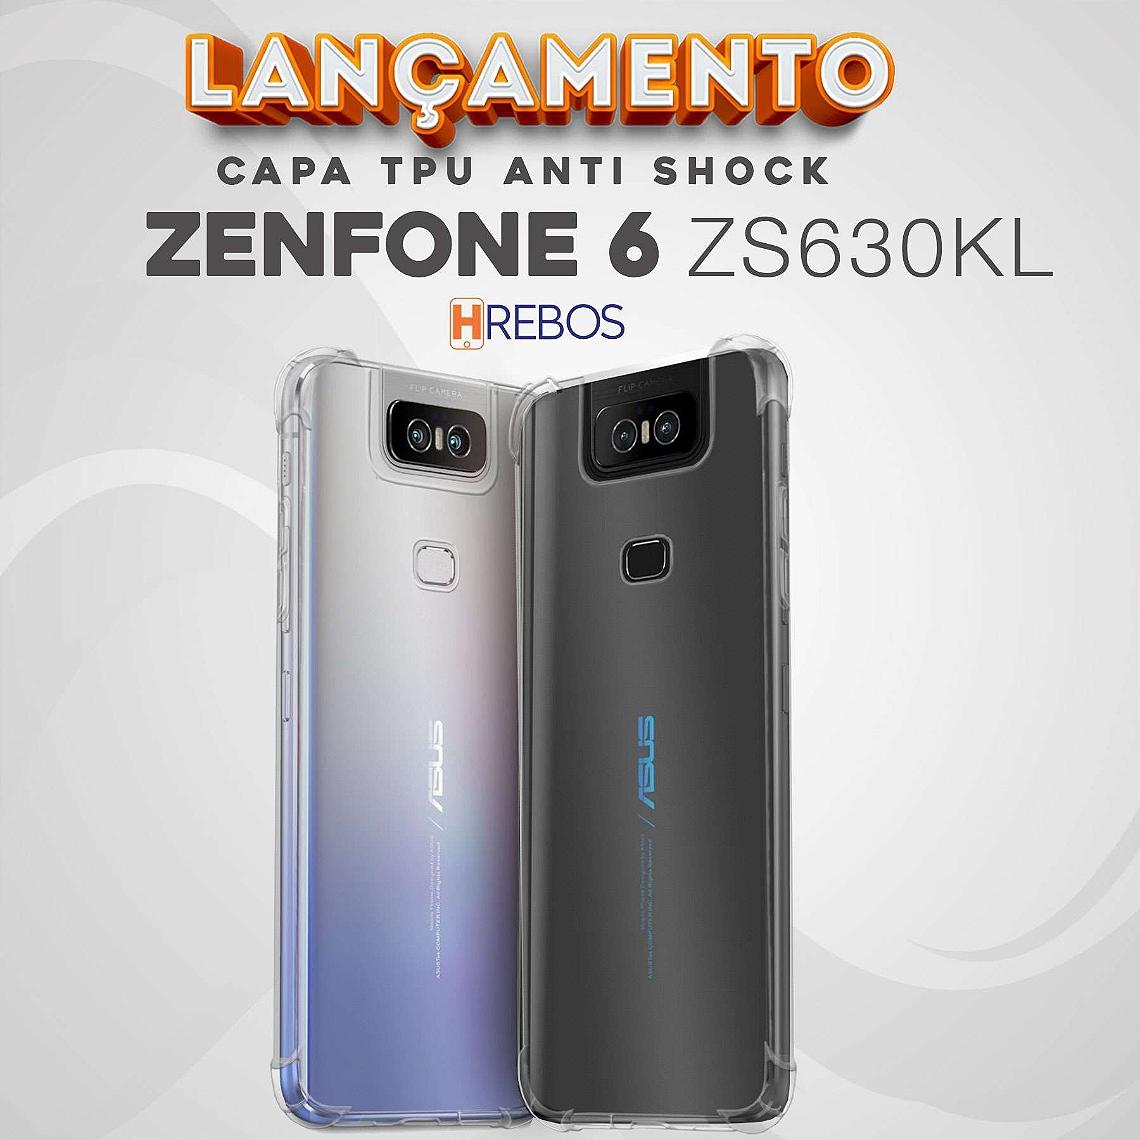 m-banner-zenfone6